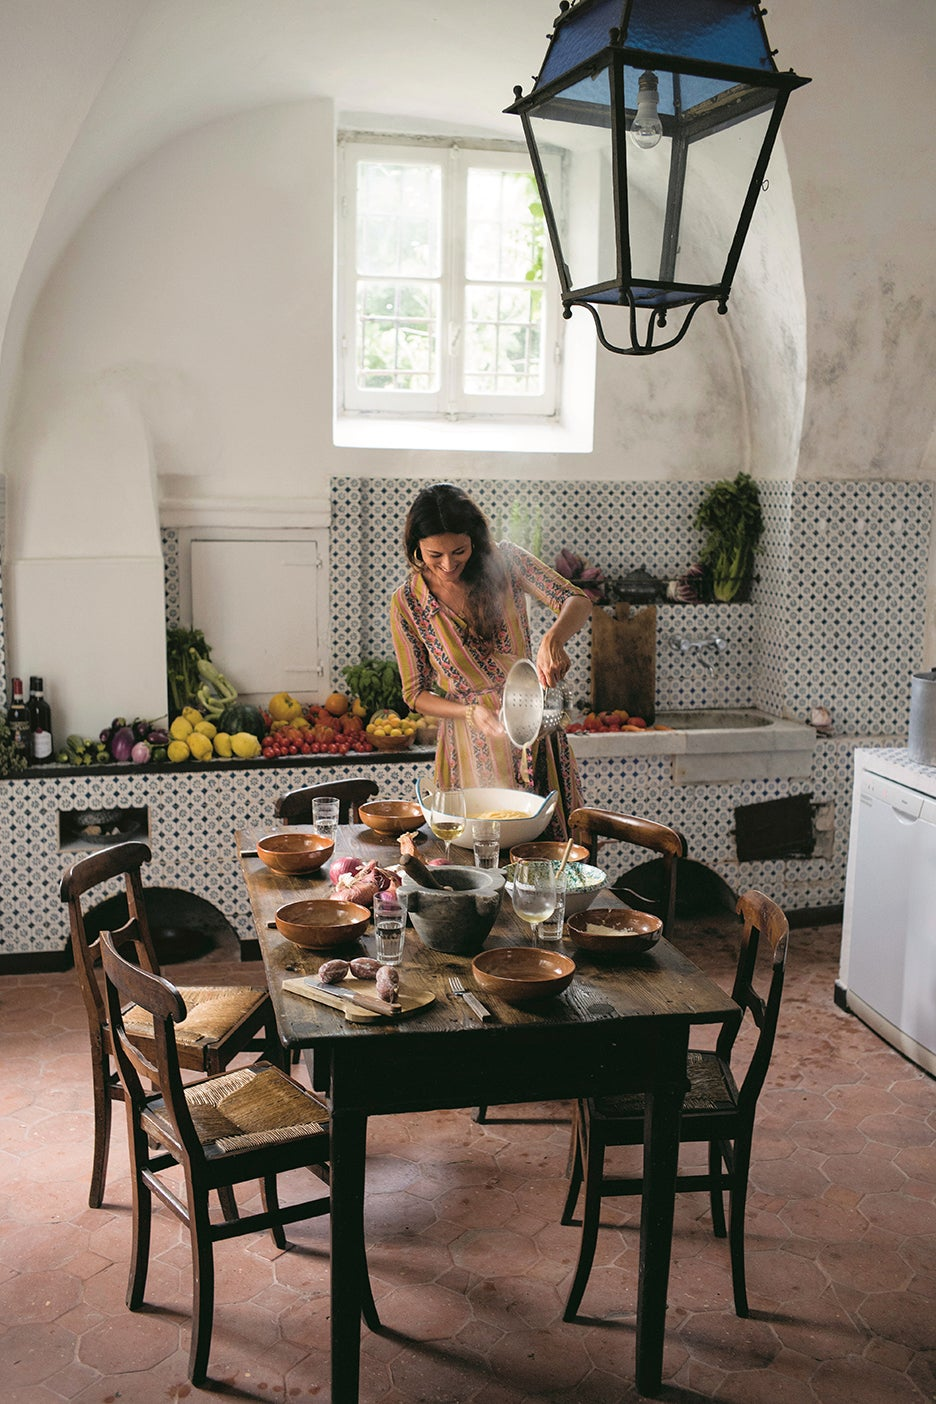 mimi thorisson in kitchen